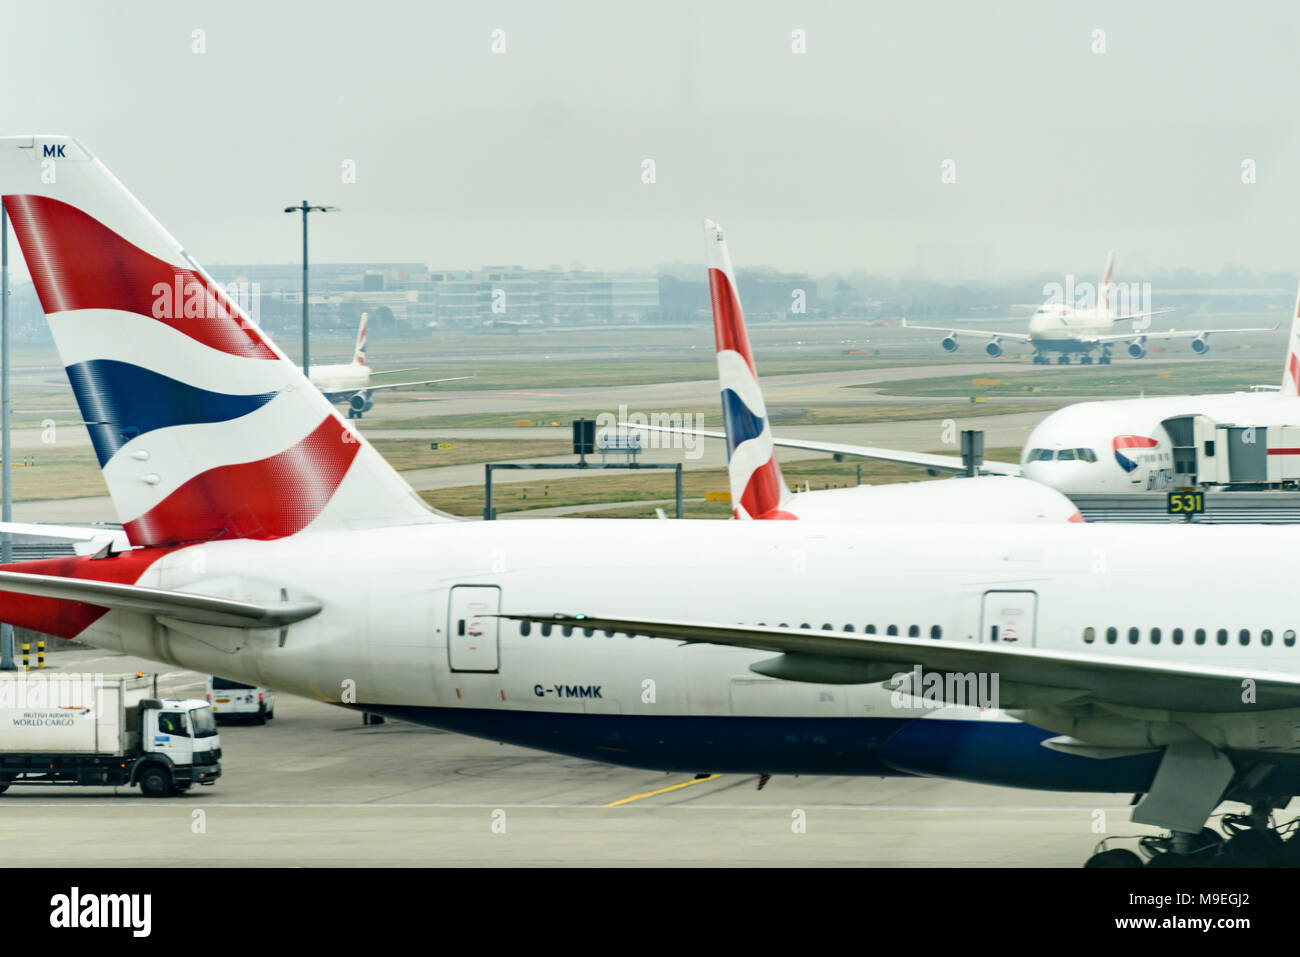 British Airways planes and tailfins at Heathrow Airport, London, England, UK Stock Photo